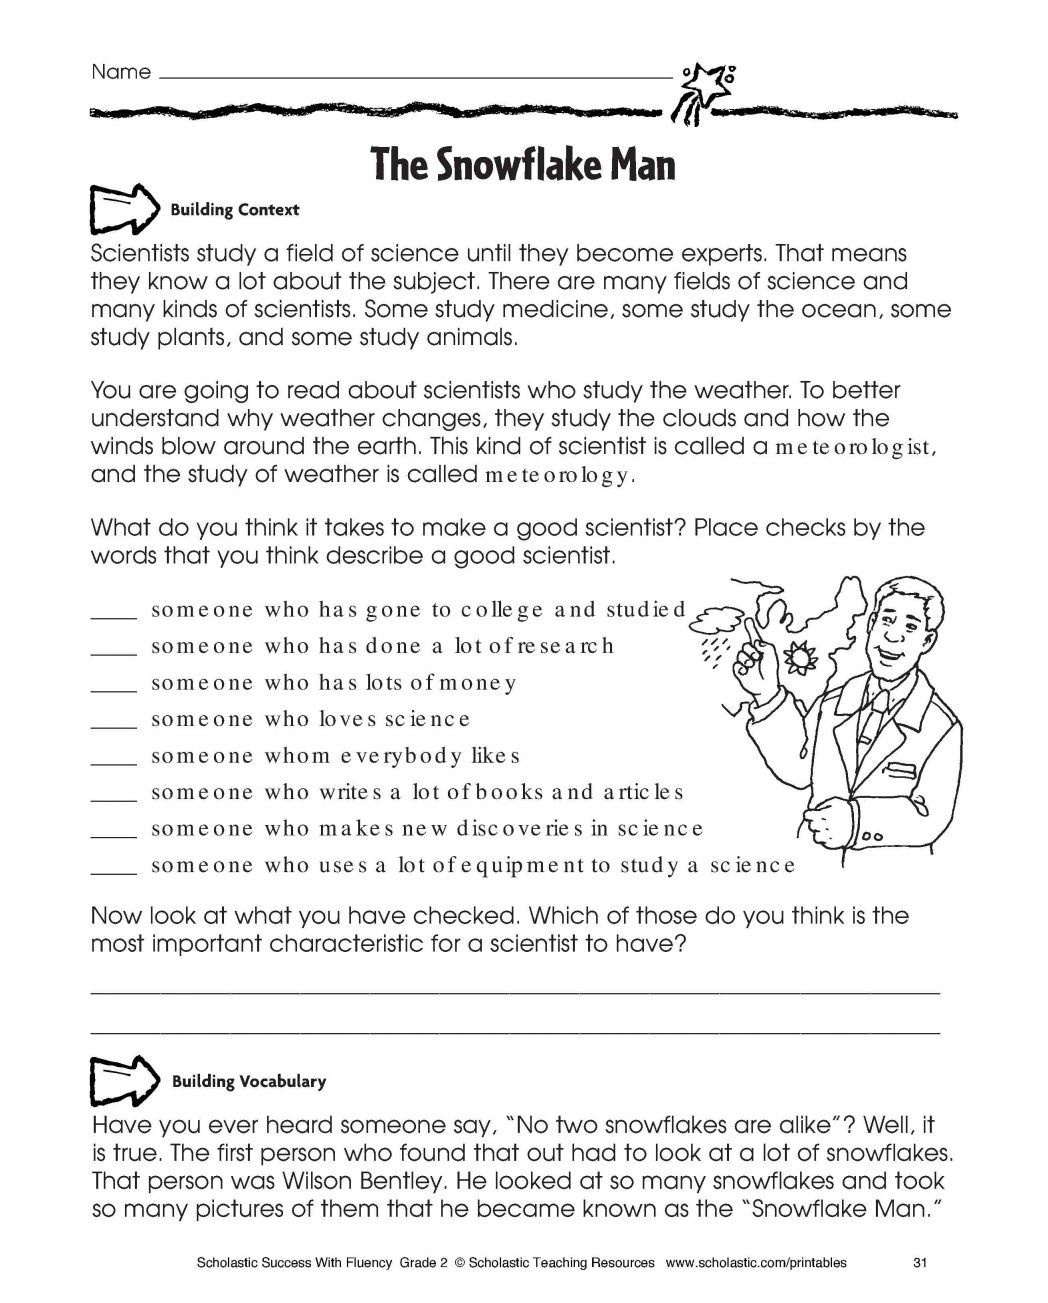 Free Printable Reading Comprehension Worksheets For Kindergarten - Free Printable 4Th Grade Reading Worksheets